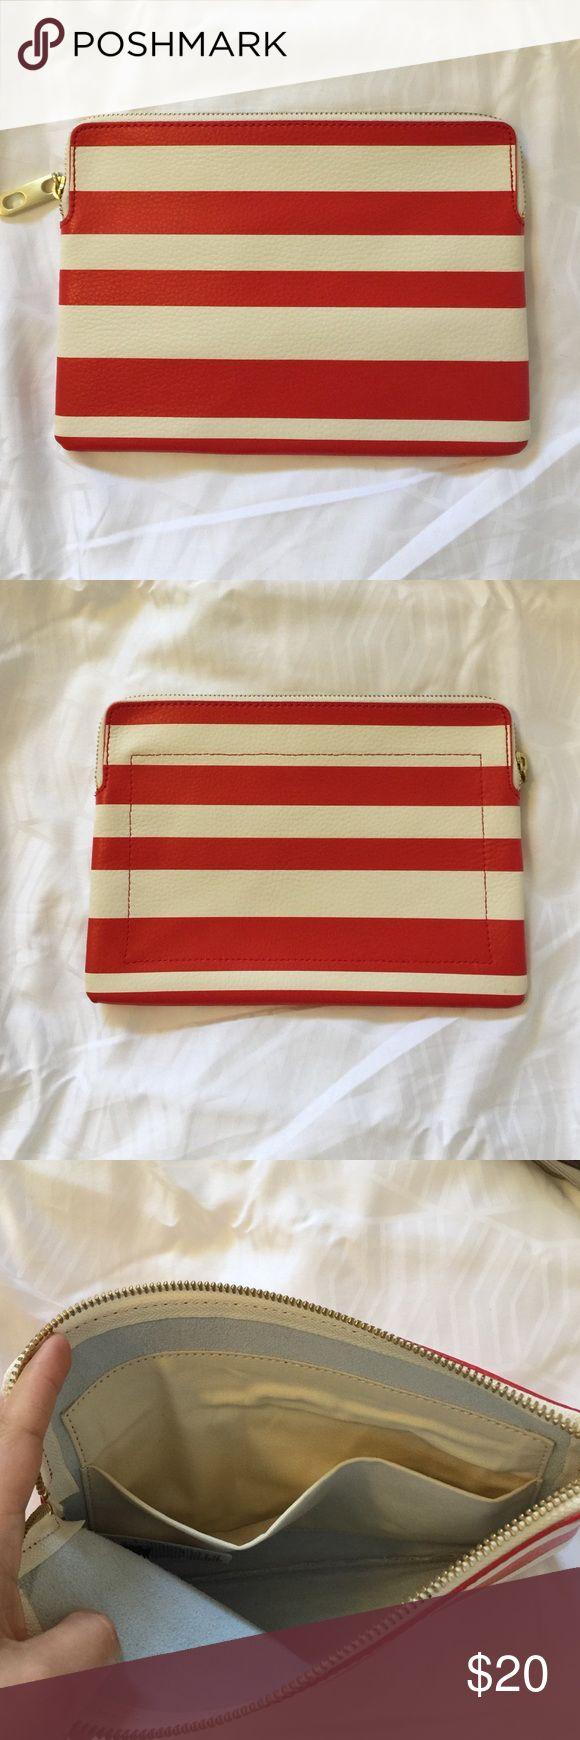 Leather gap bag Beautiful makeup bag or wallet GAP Bags Wallets